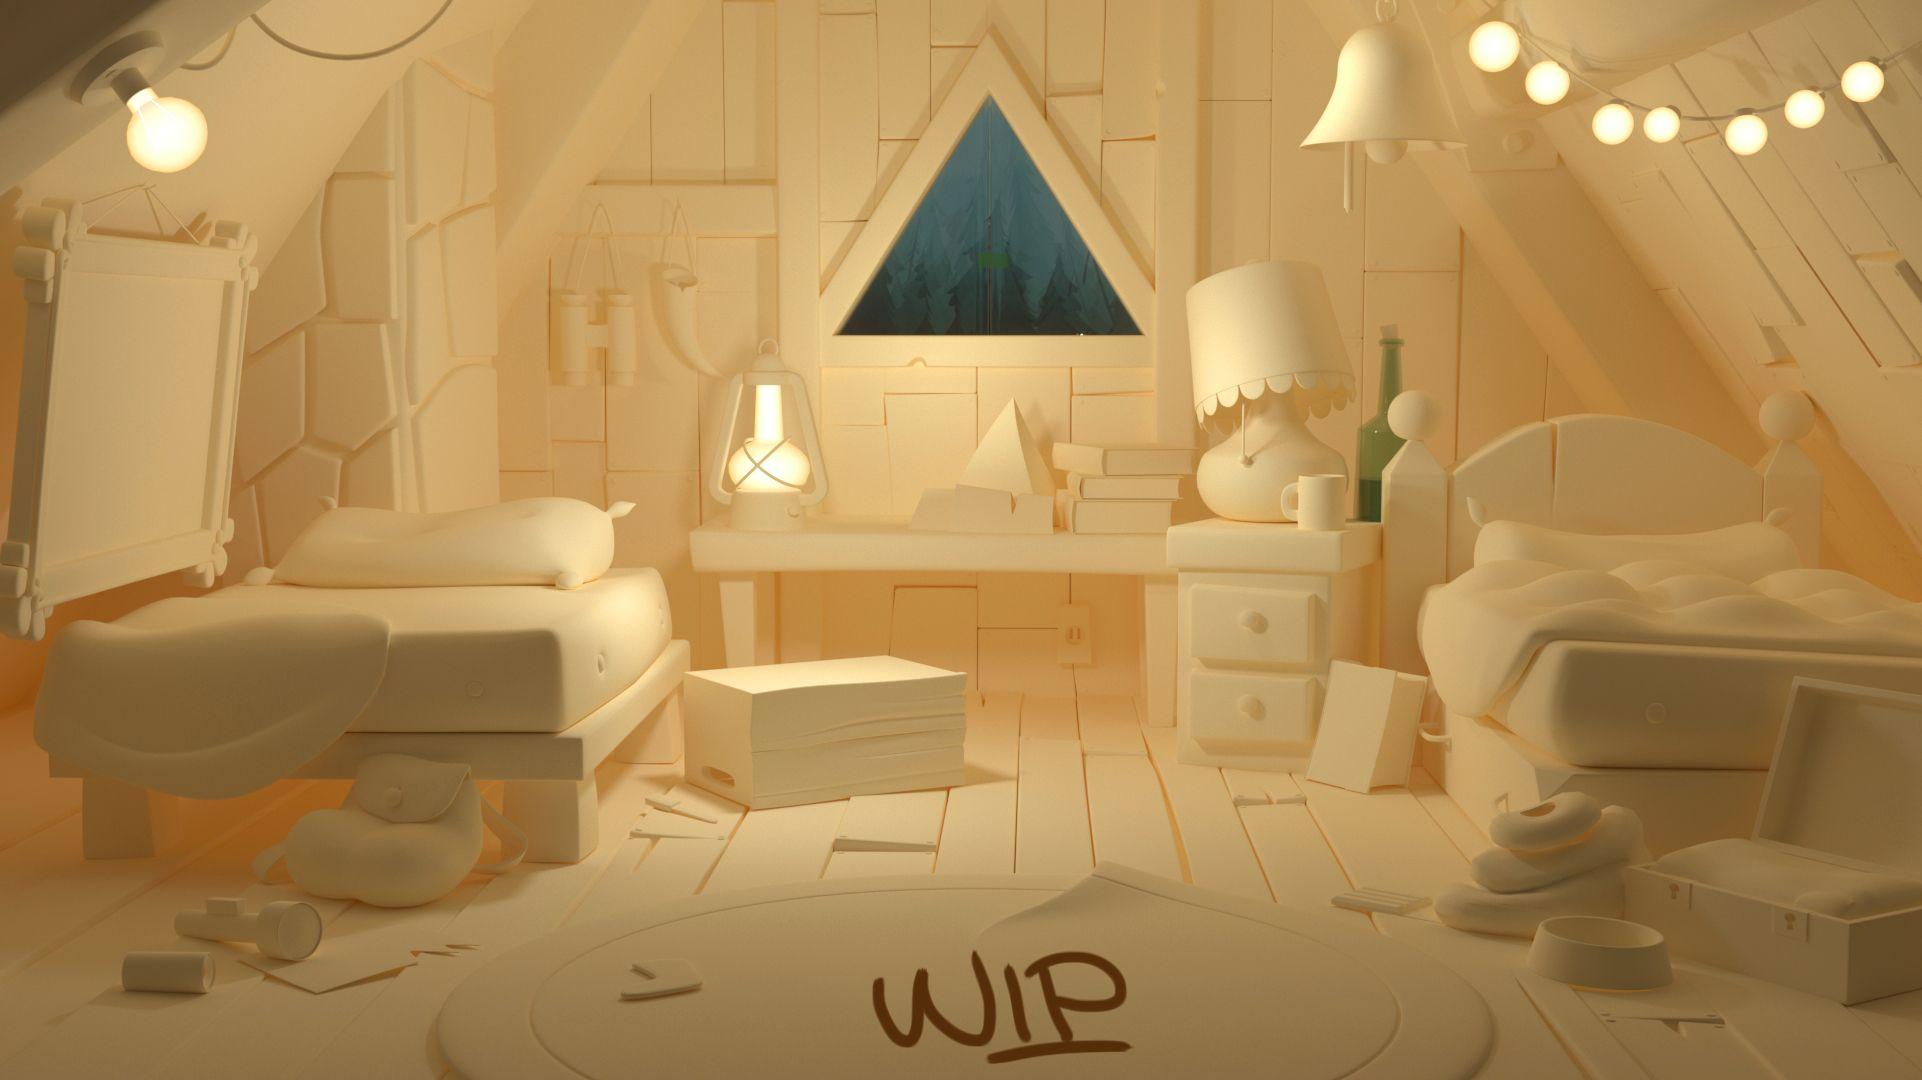 Gravity Falls Room Wip 2 Sofia R Picasso Gravity Falls Picasso Environment Design